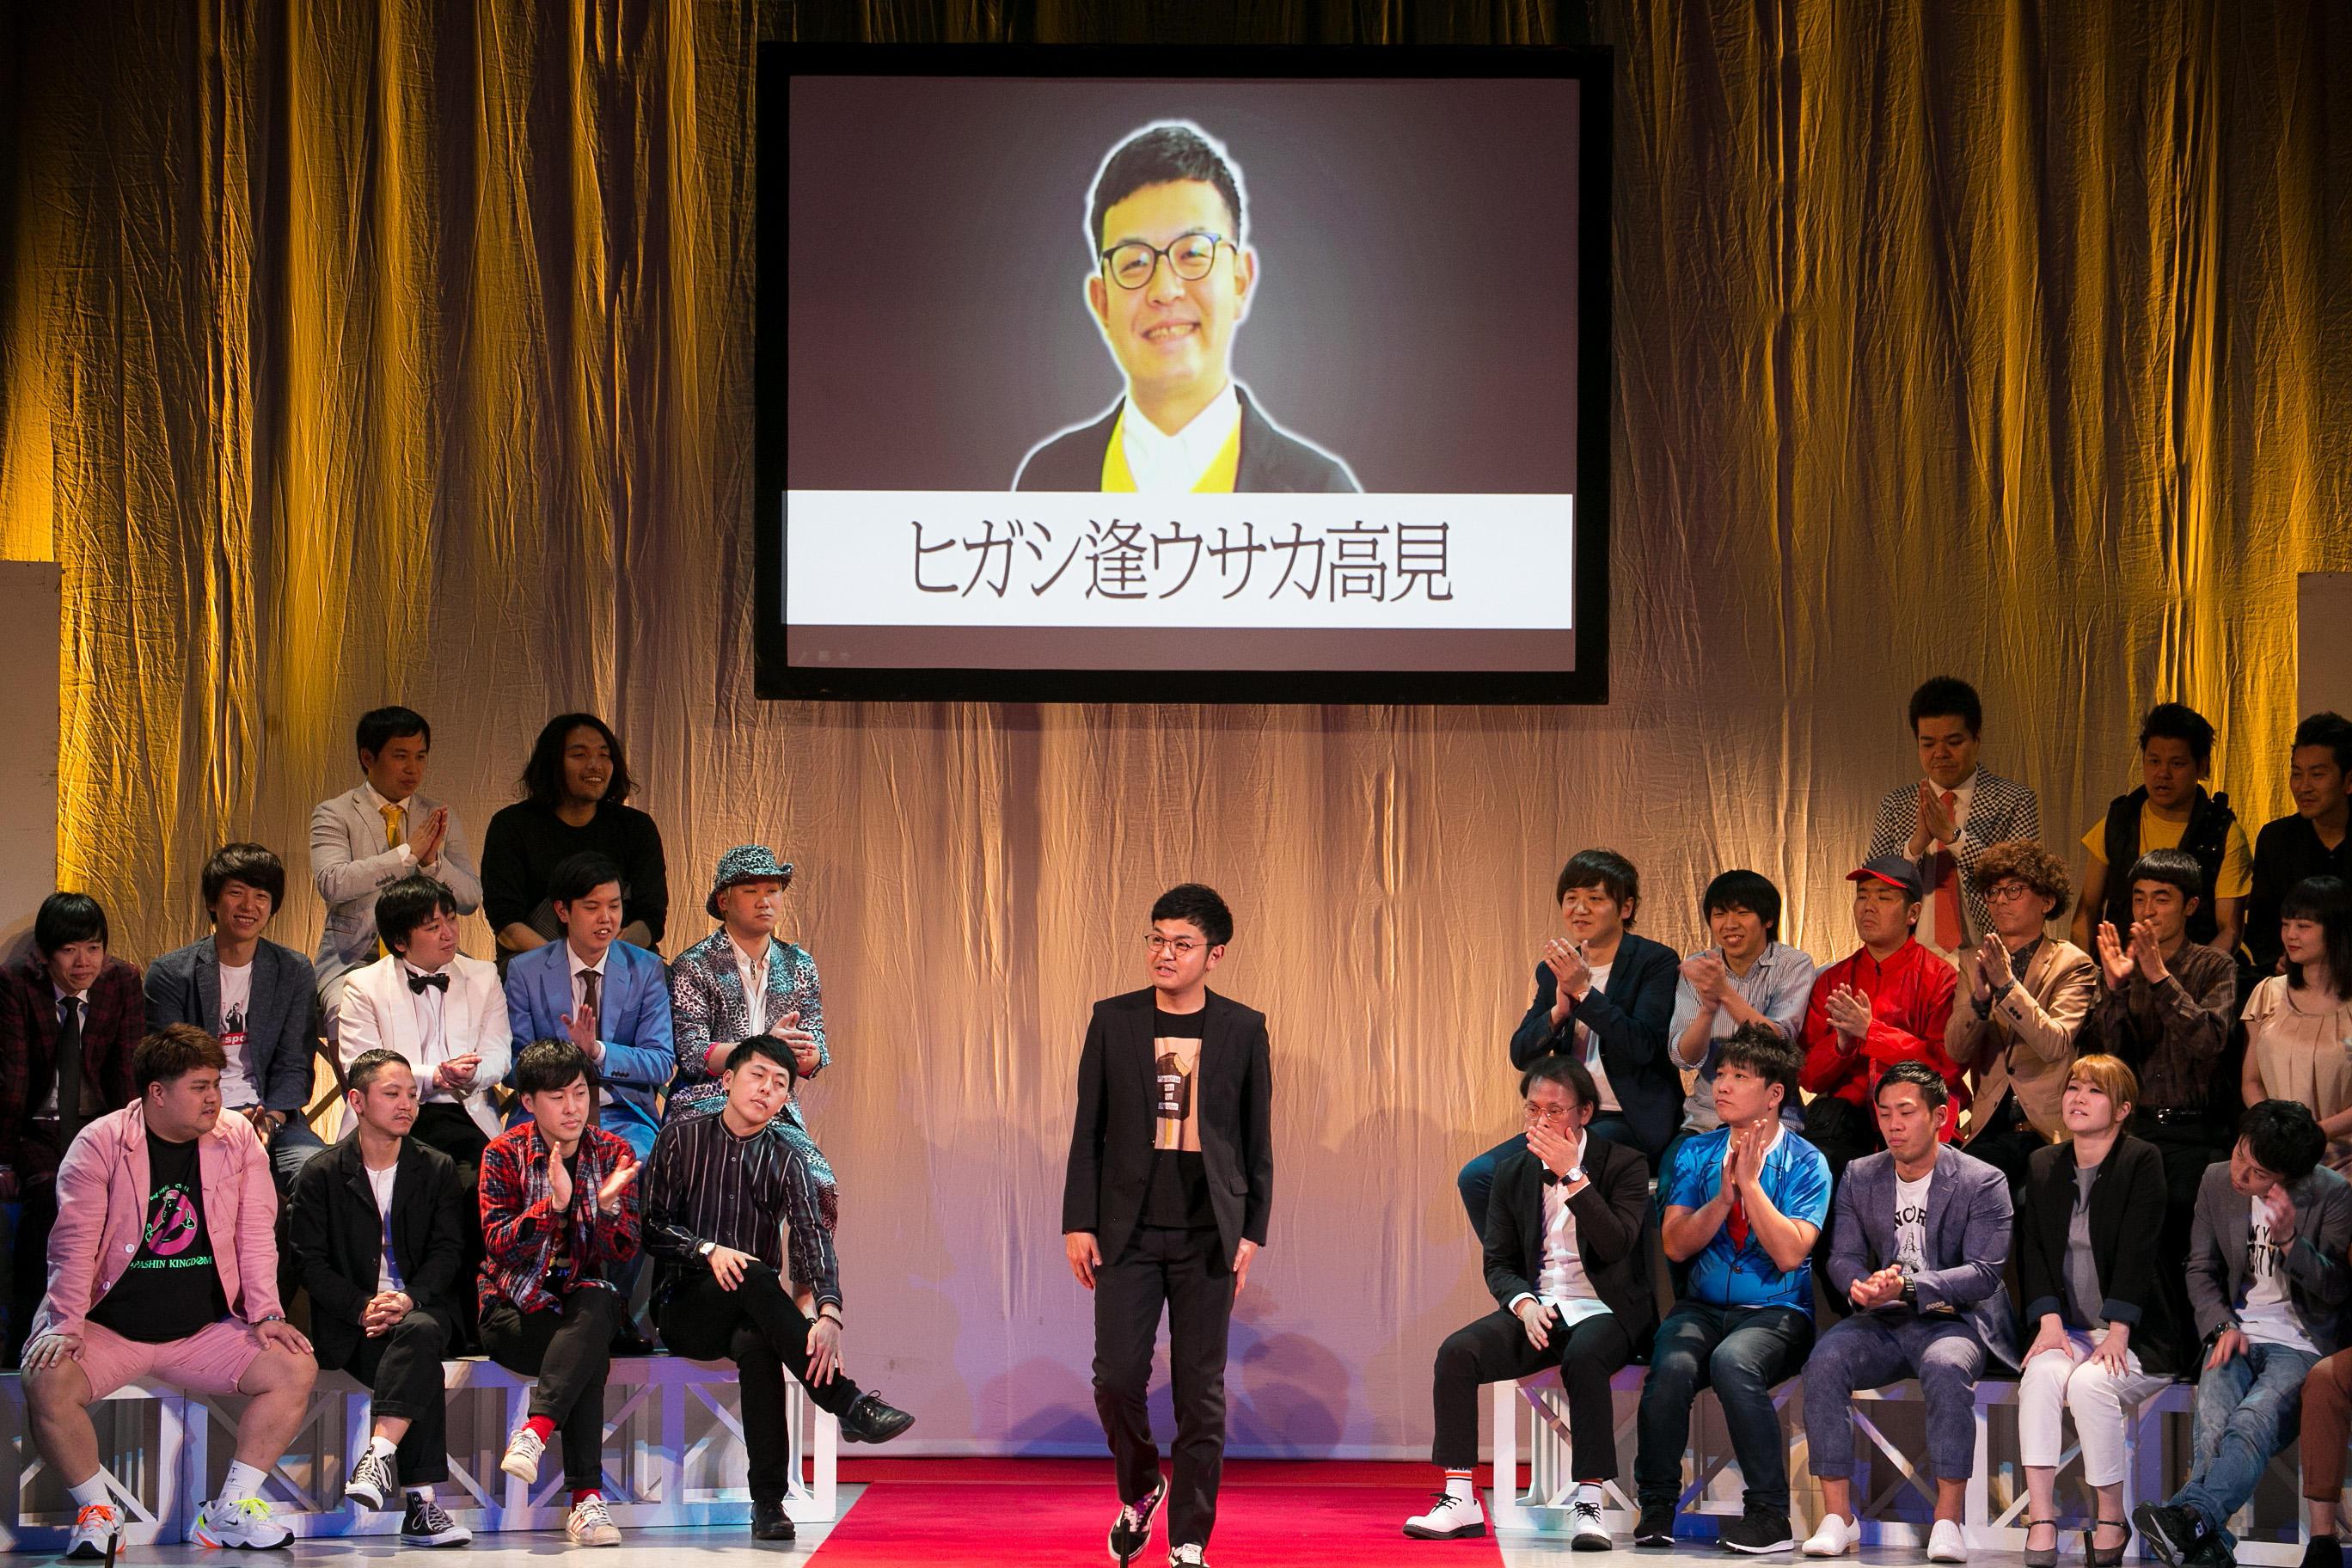 http://news.yoshimoto.co.jp/20181228113217-f82b744e9e0b91cc8aa982e7b2be1b3eacf293b2.jpg